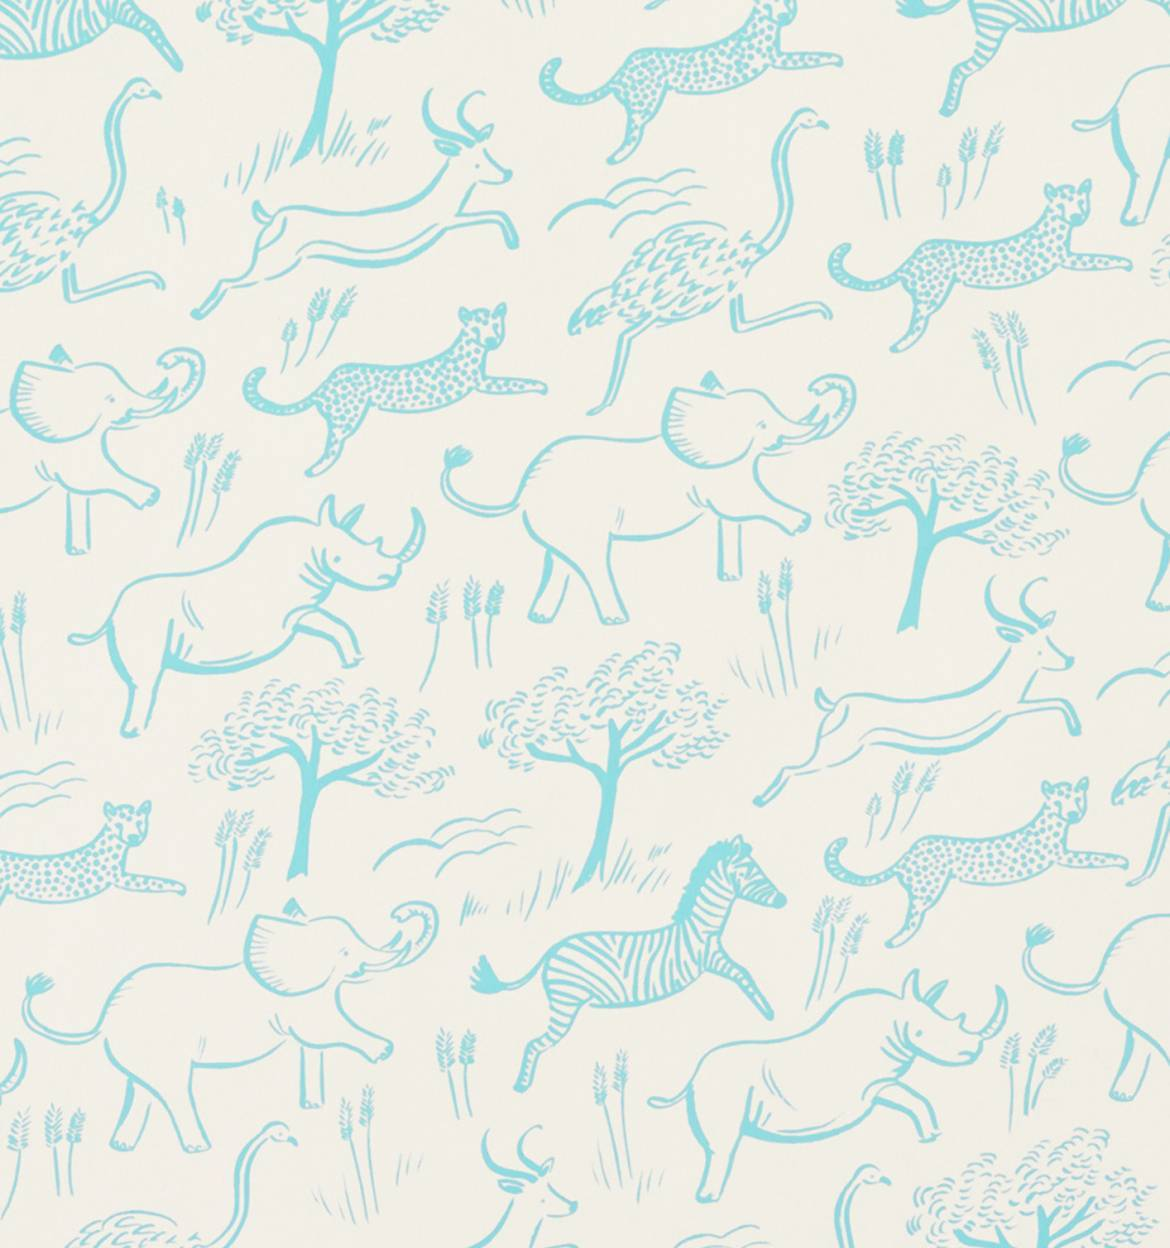 Safari Pattern Wallpaper photo - 5